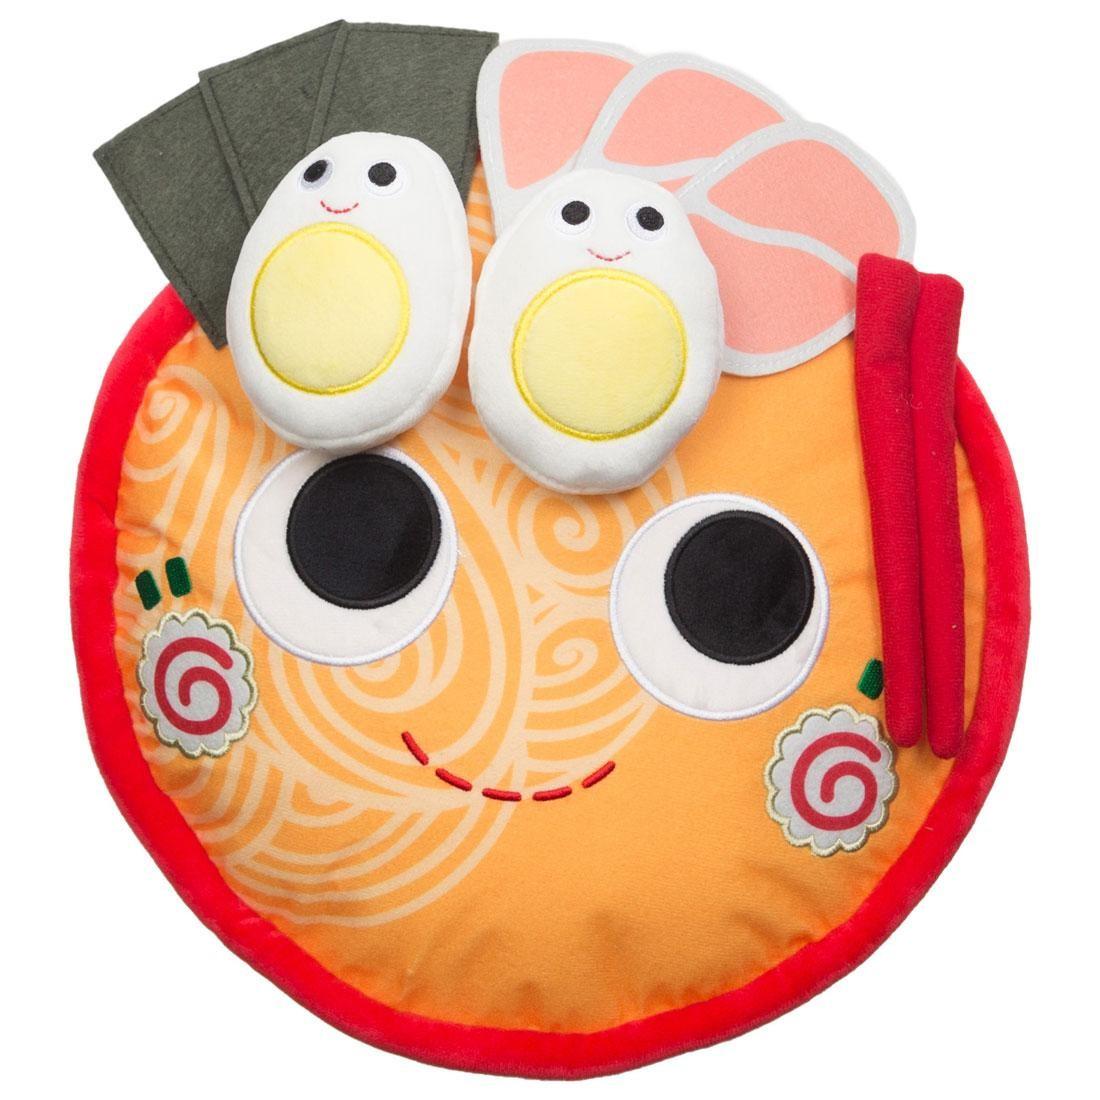 Kidrobot Yummy World Nicole The Ramen Bowl Large Plush (red)